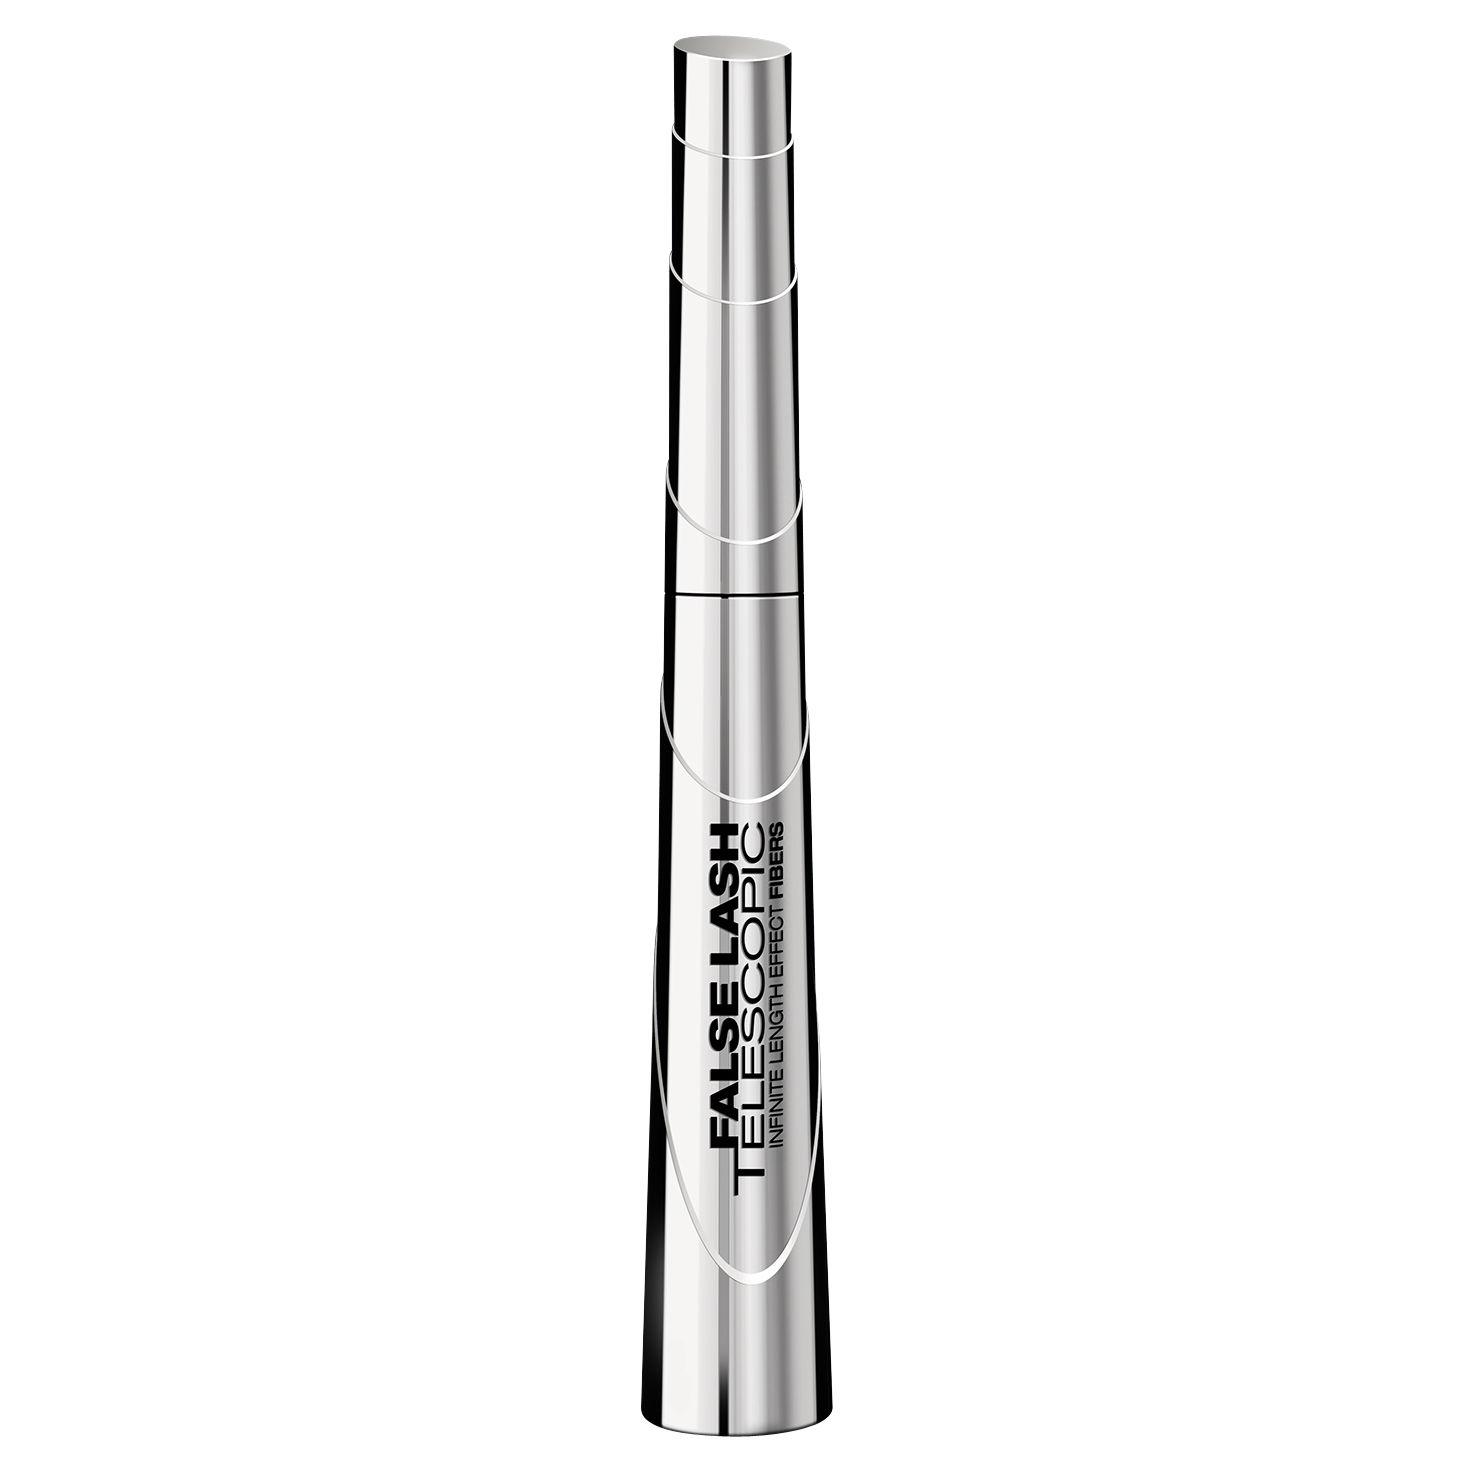 L'Oréal - False Lash Flash Telescopic Mascara - Black